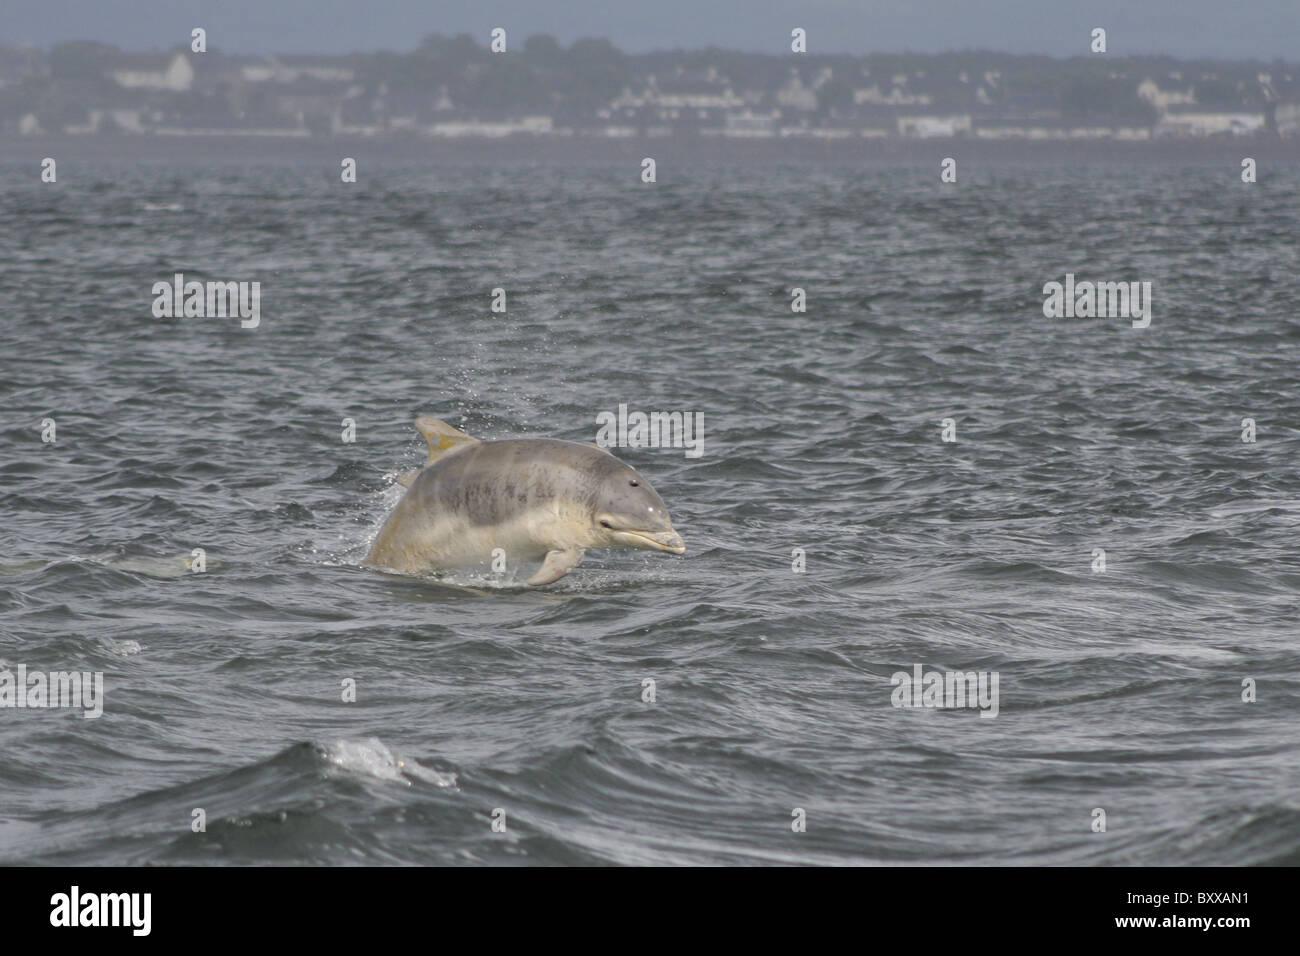 Young Bottlenose dolphin (tursiops truncatus), Moray Firth, Scotland, UK - Stock Image